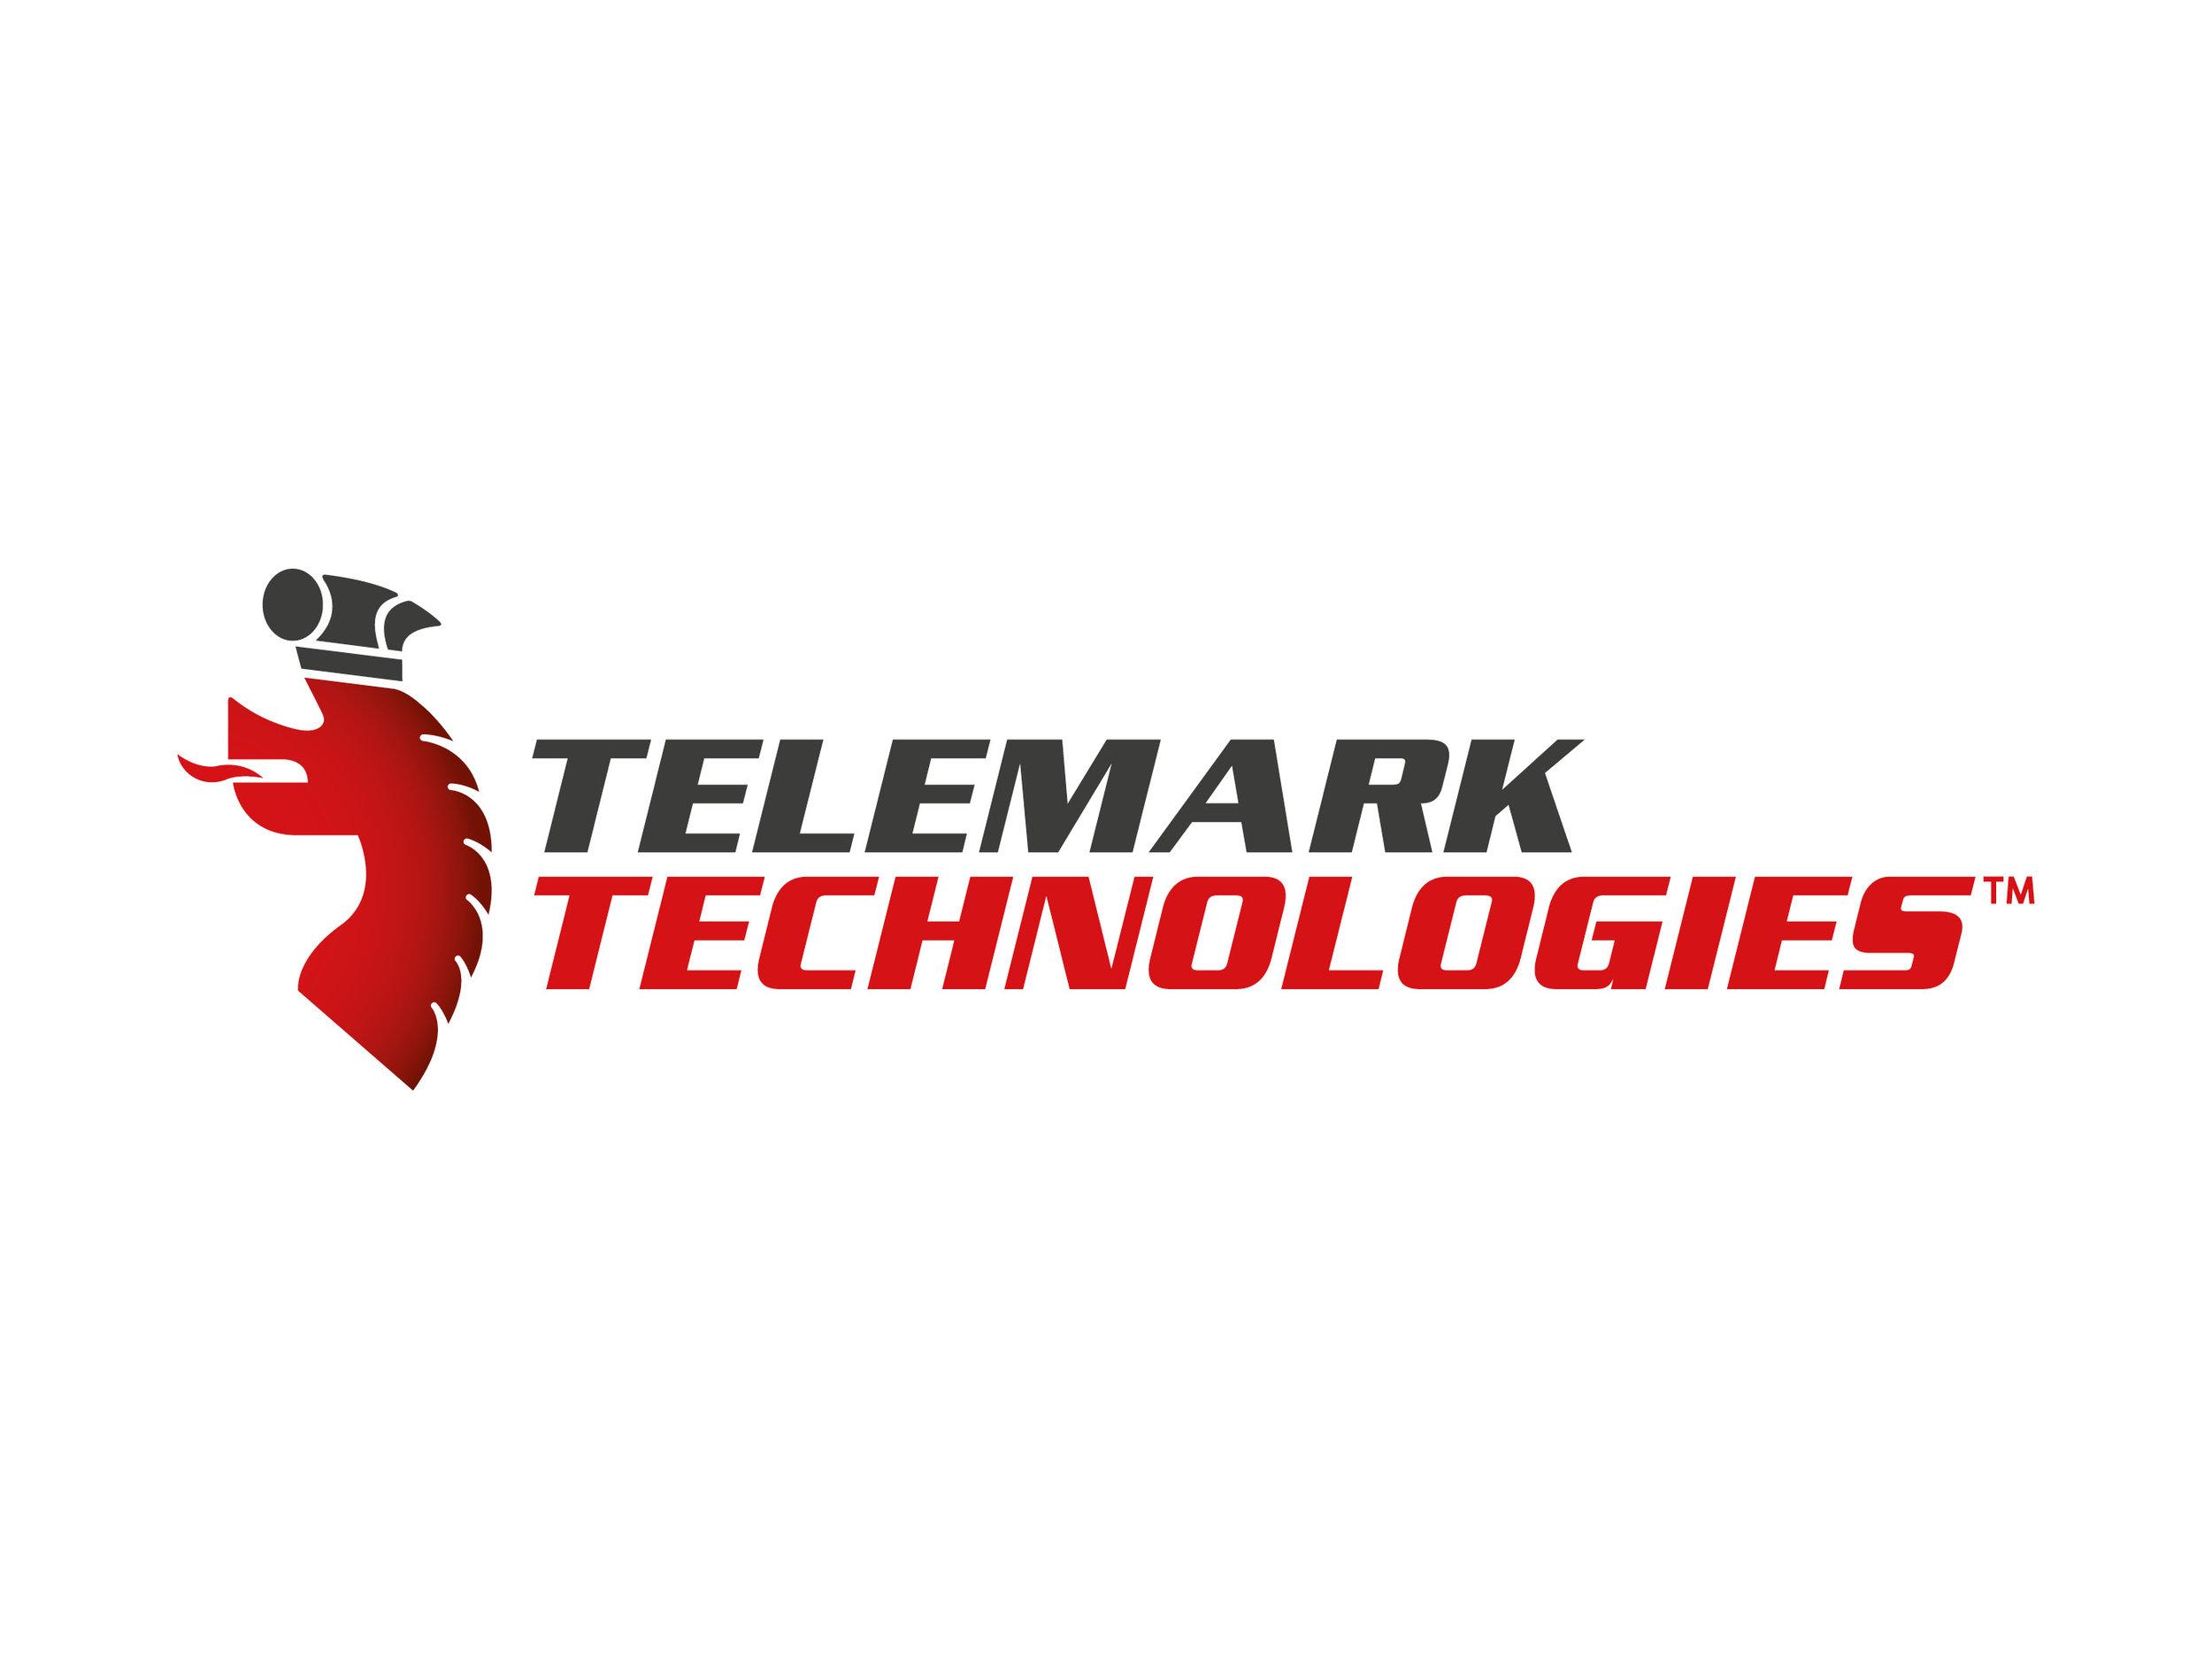 telemark technologies.jpg